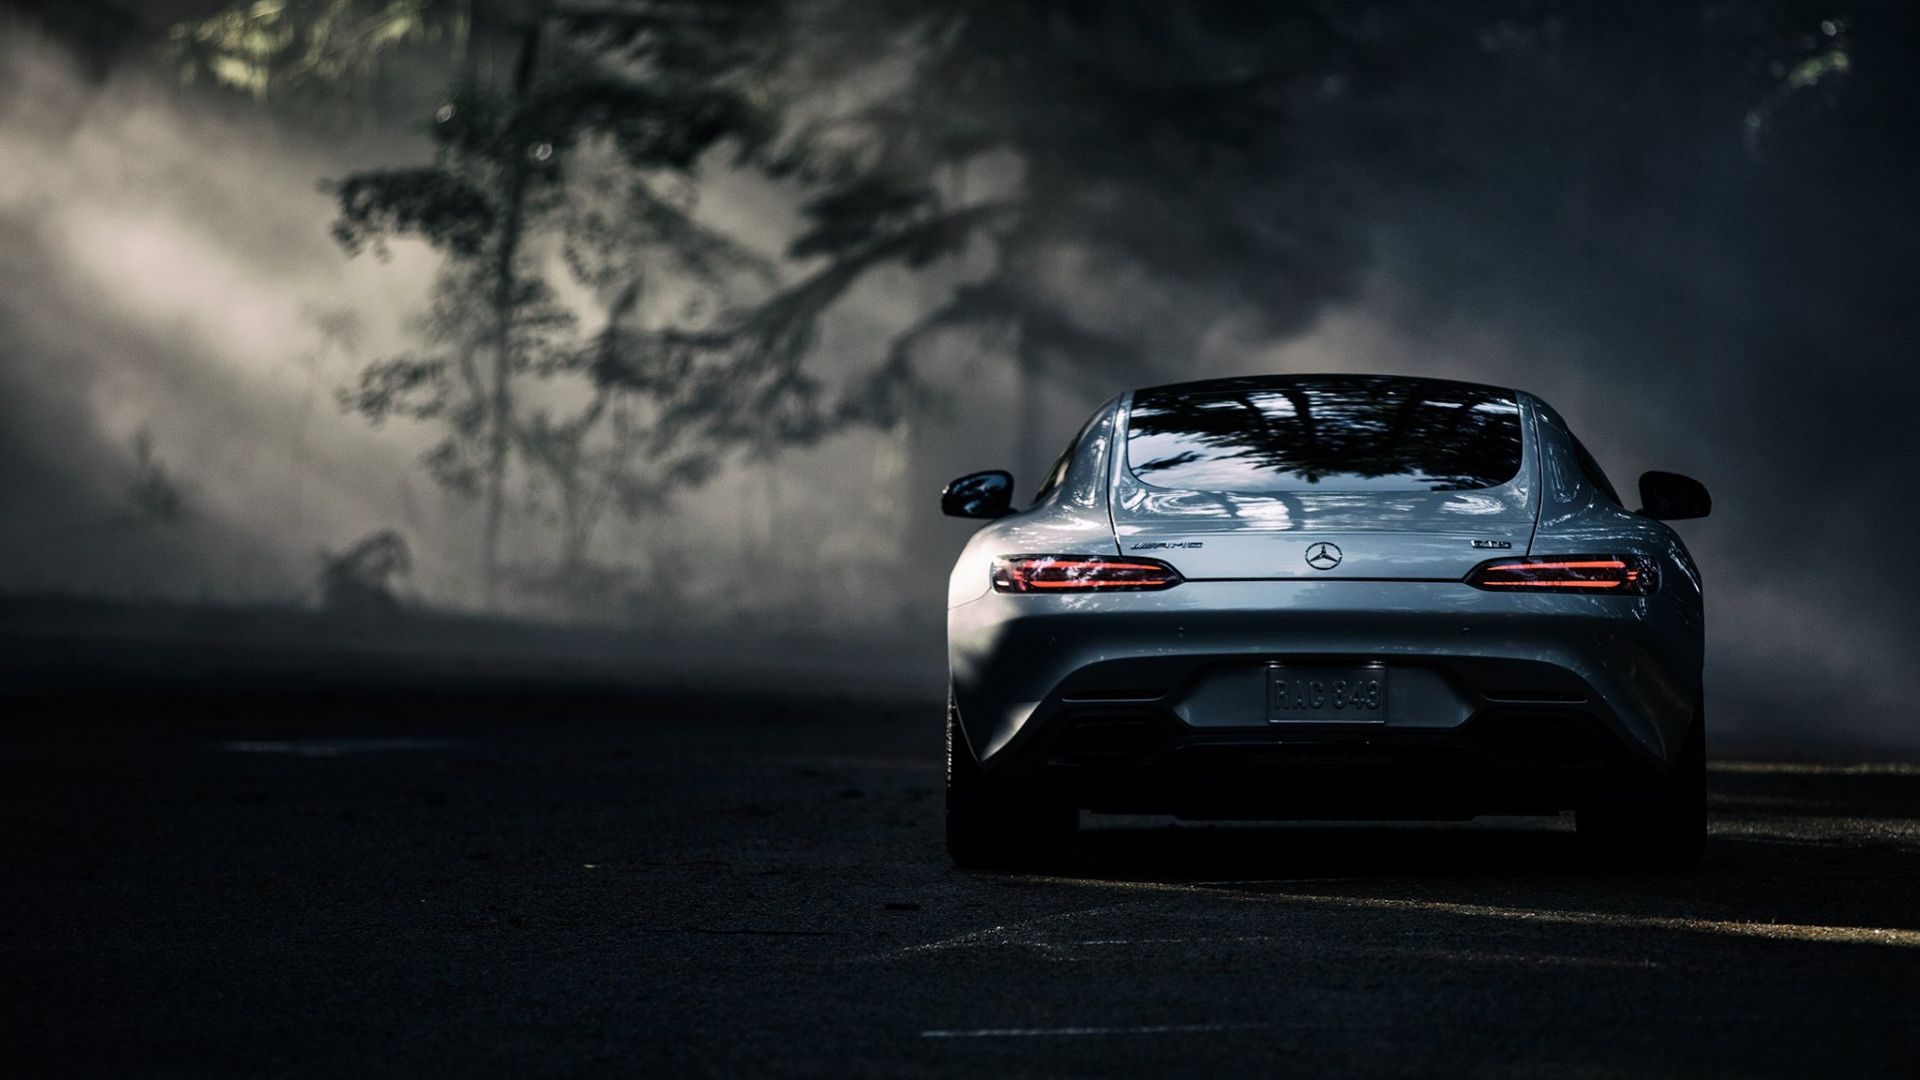 1080p Muscle Car Wallpaper Full Hd 1080p Mercedes Benz Wallpaper Latest Mercedes Benz